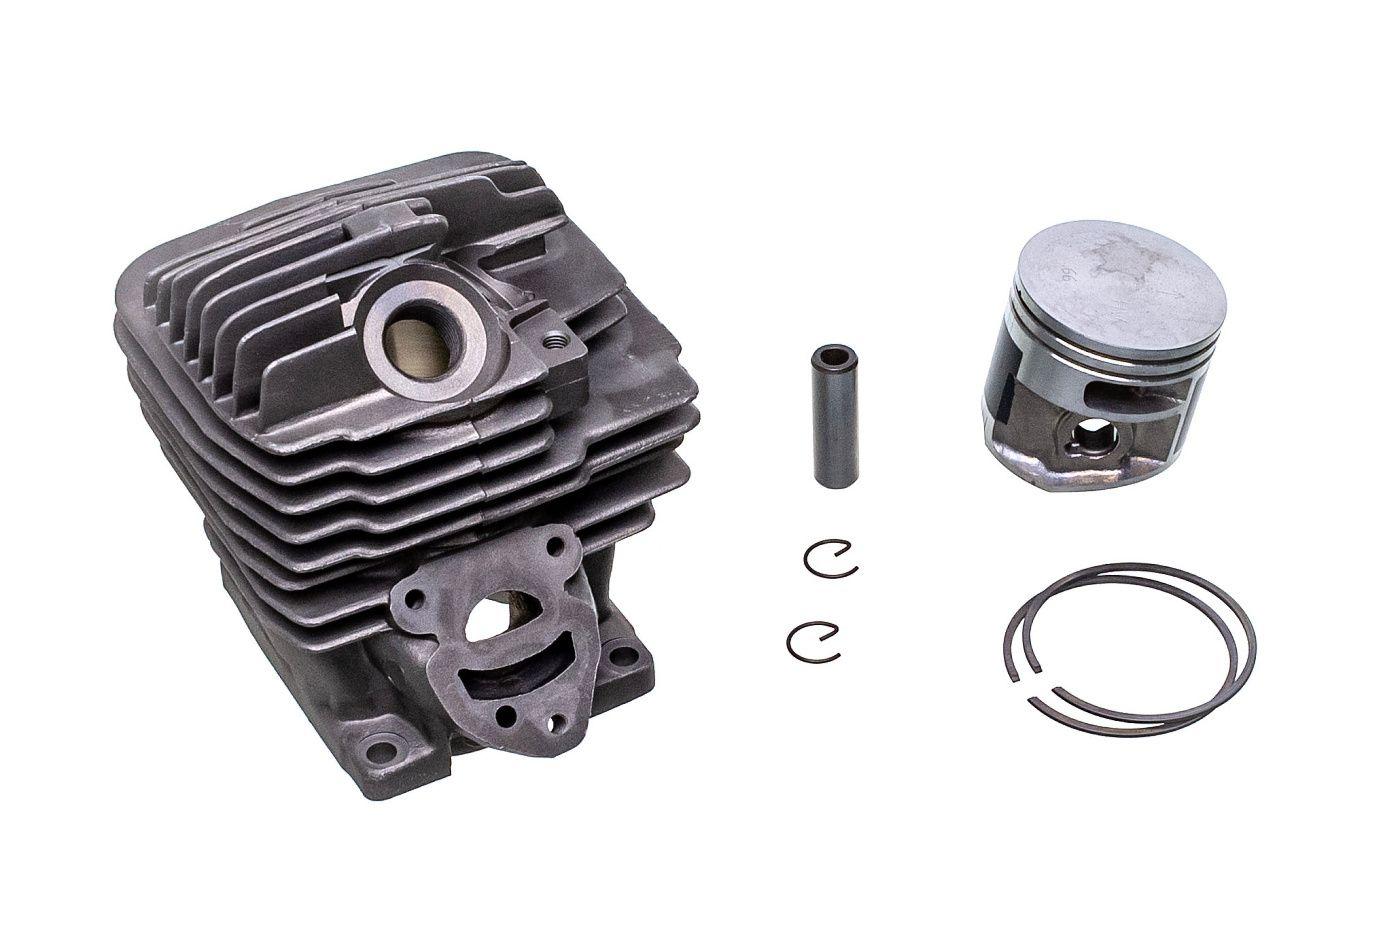 Kompletný valec Stihl MS261 MS261C EVEREST NIKASIL 44,7mm - 11410201200